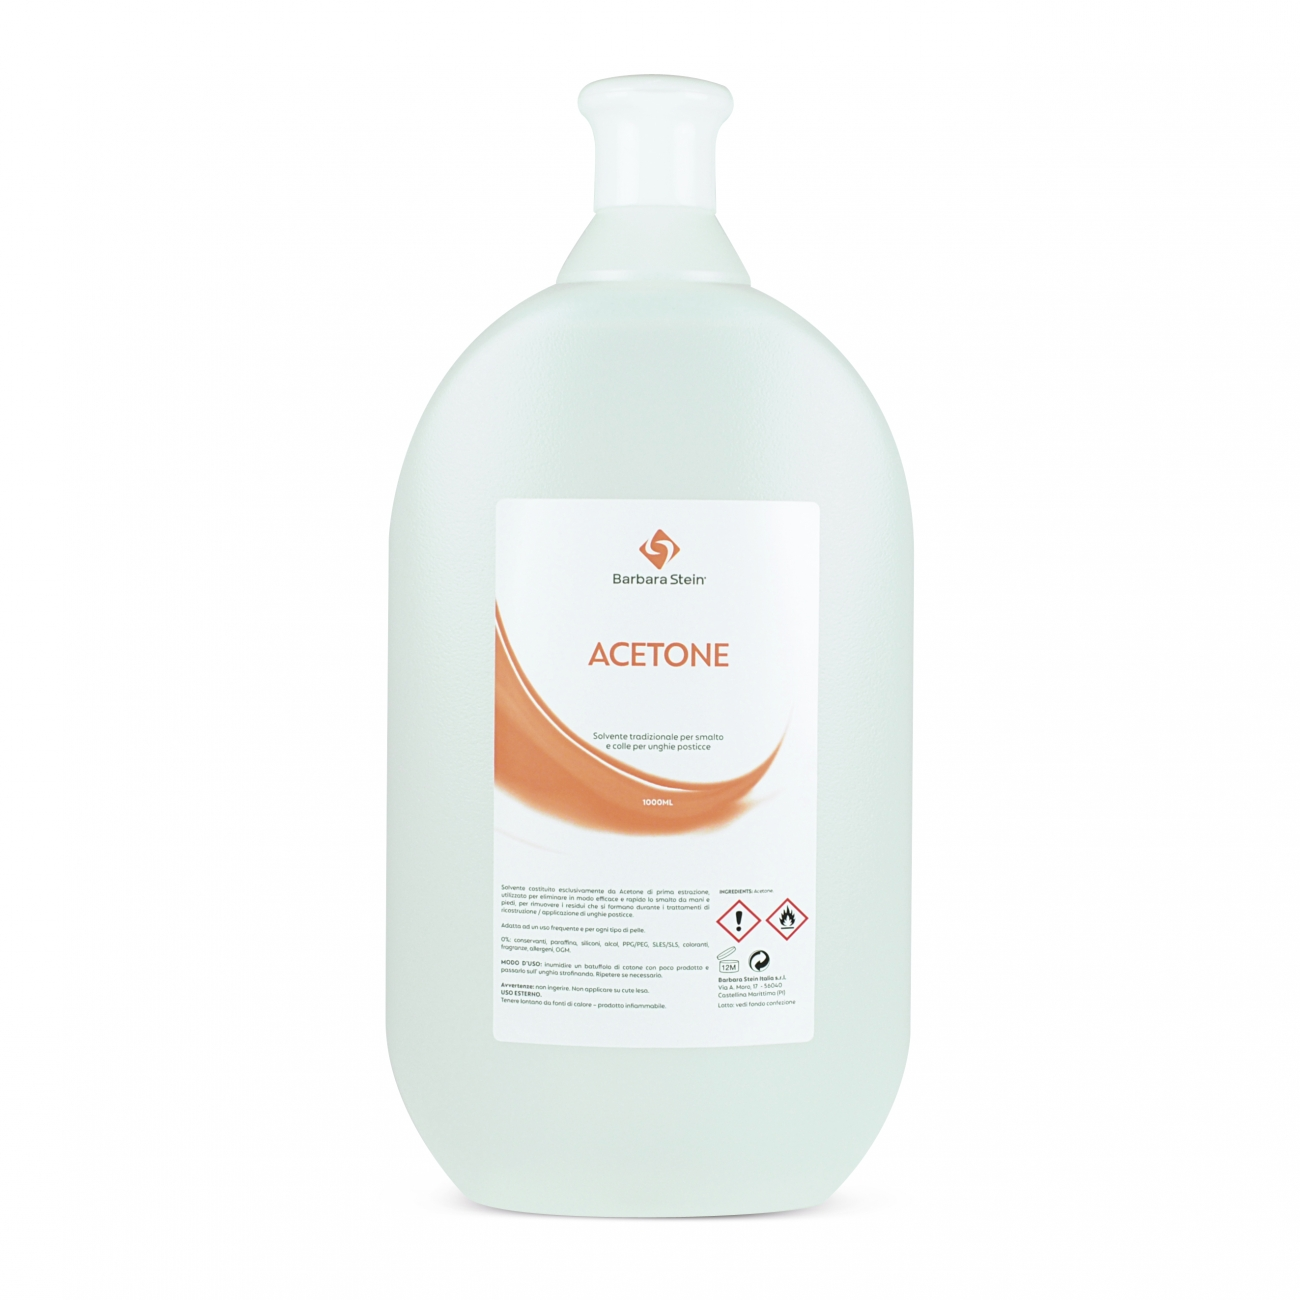 ACETONE (1000 ml)